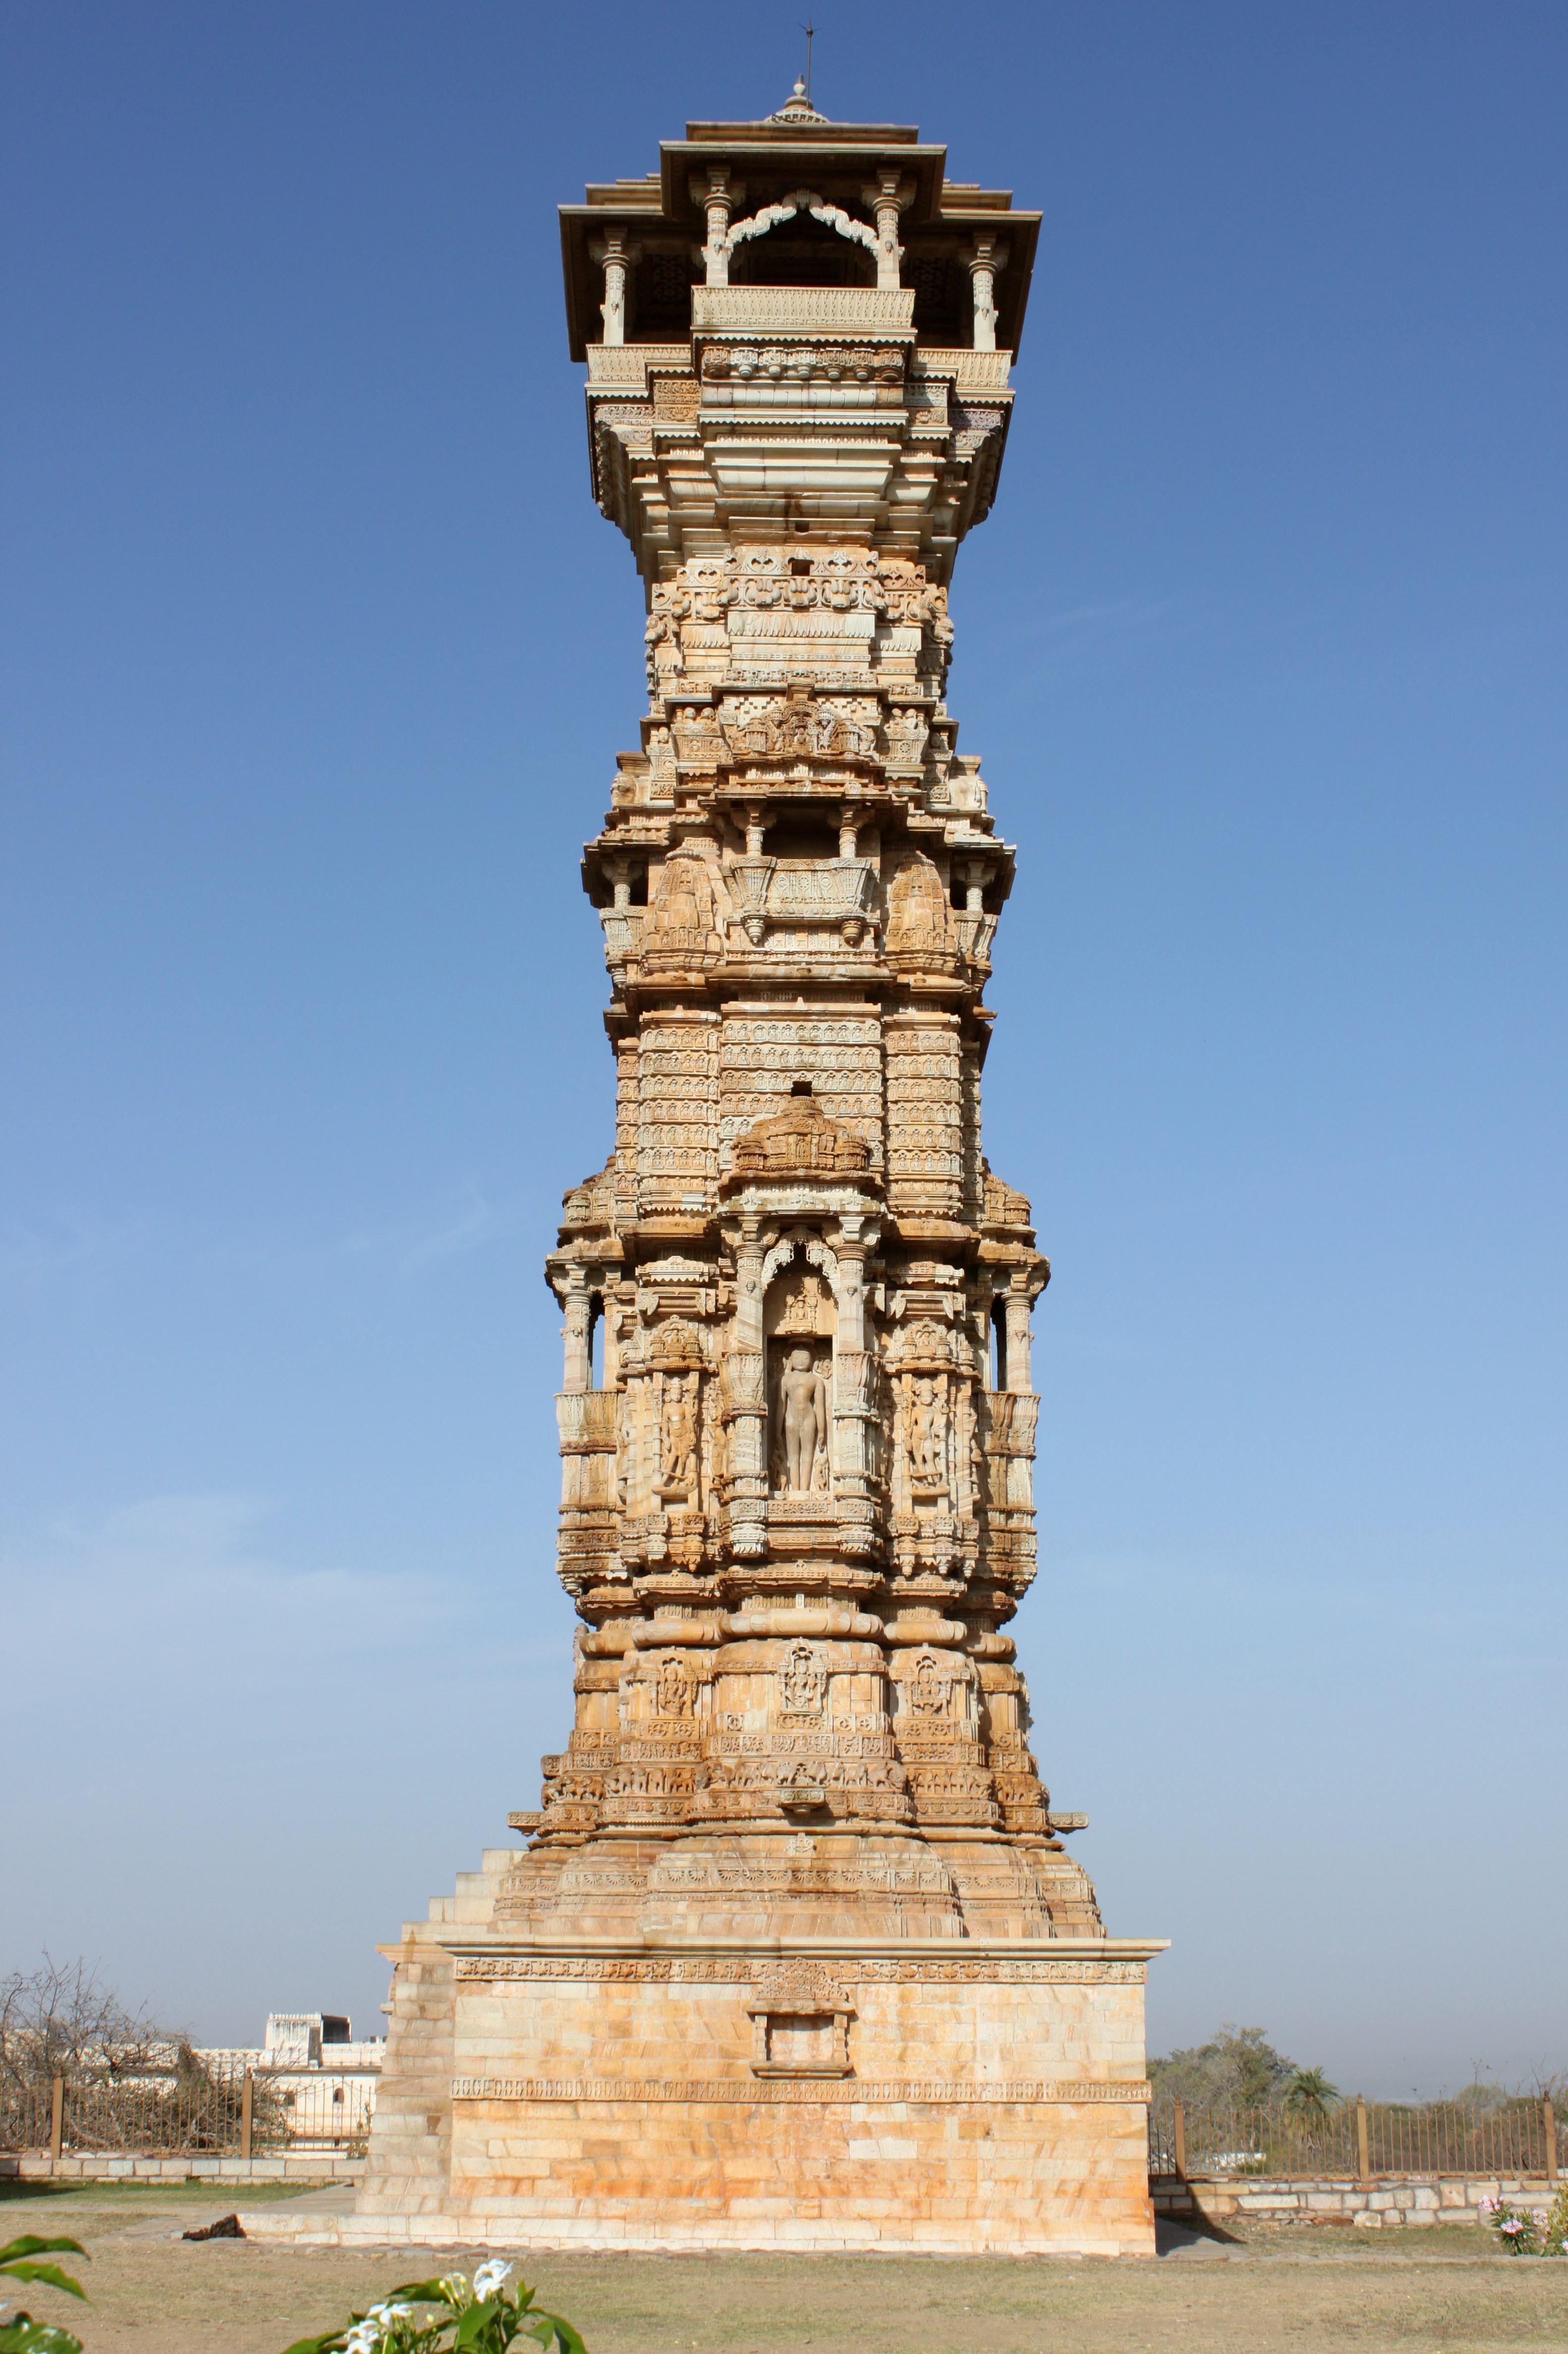 Kirti Stambha (Tower of Fame) 9